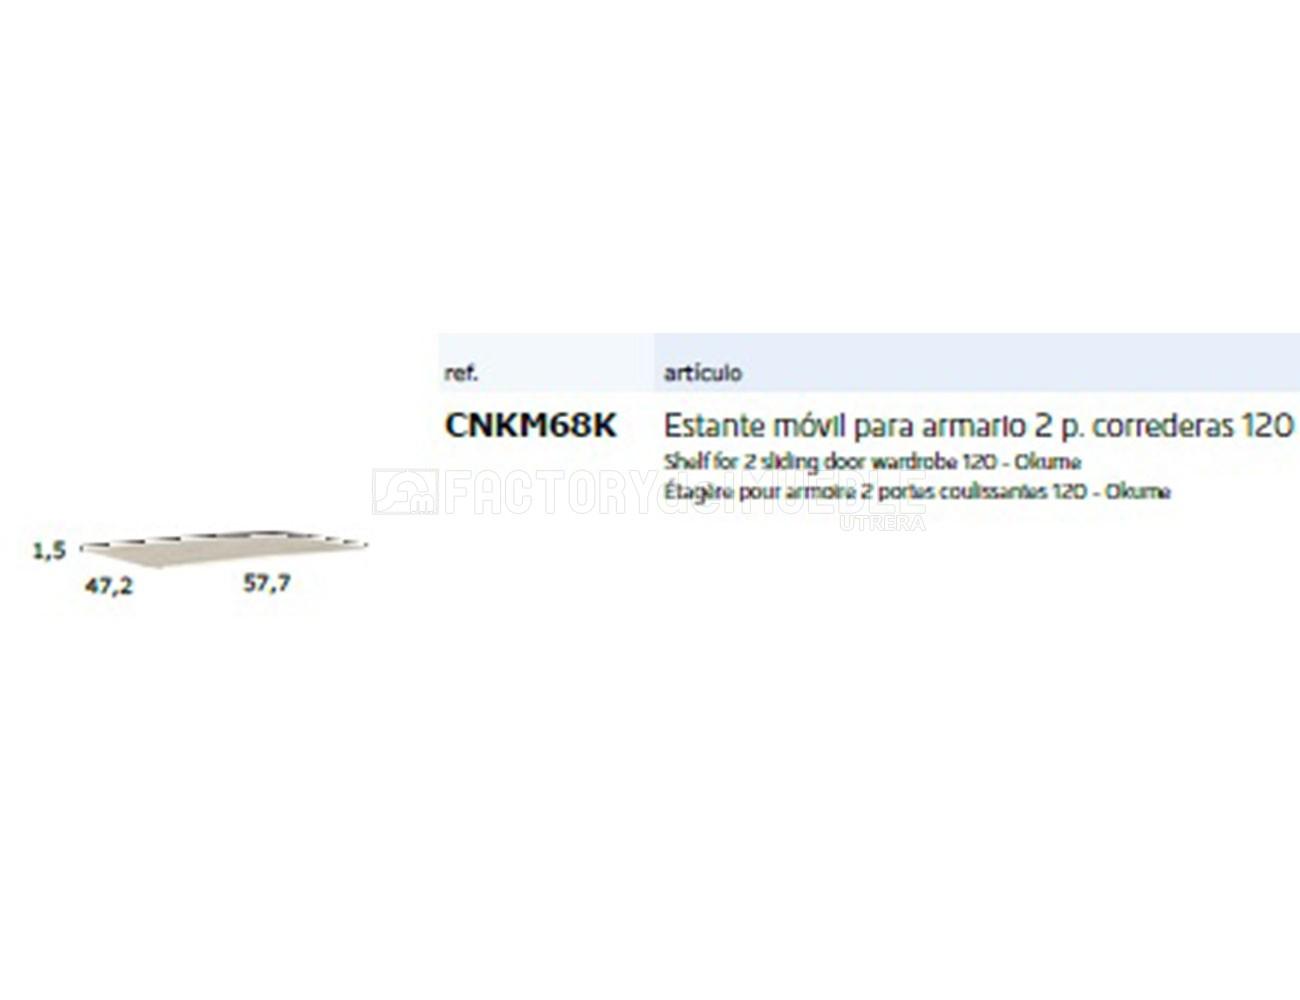 Cnkm68k estante movil para armario 2p correderas 120